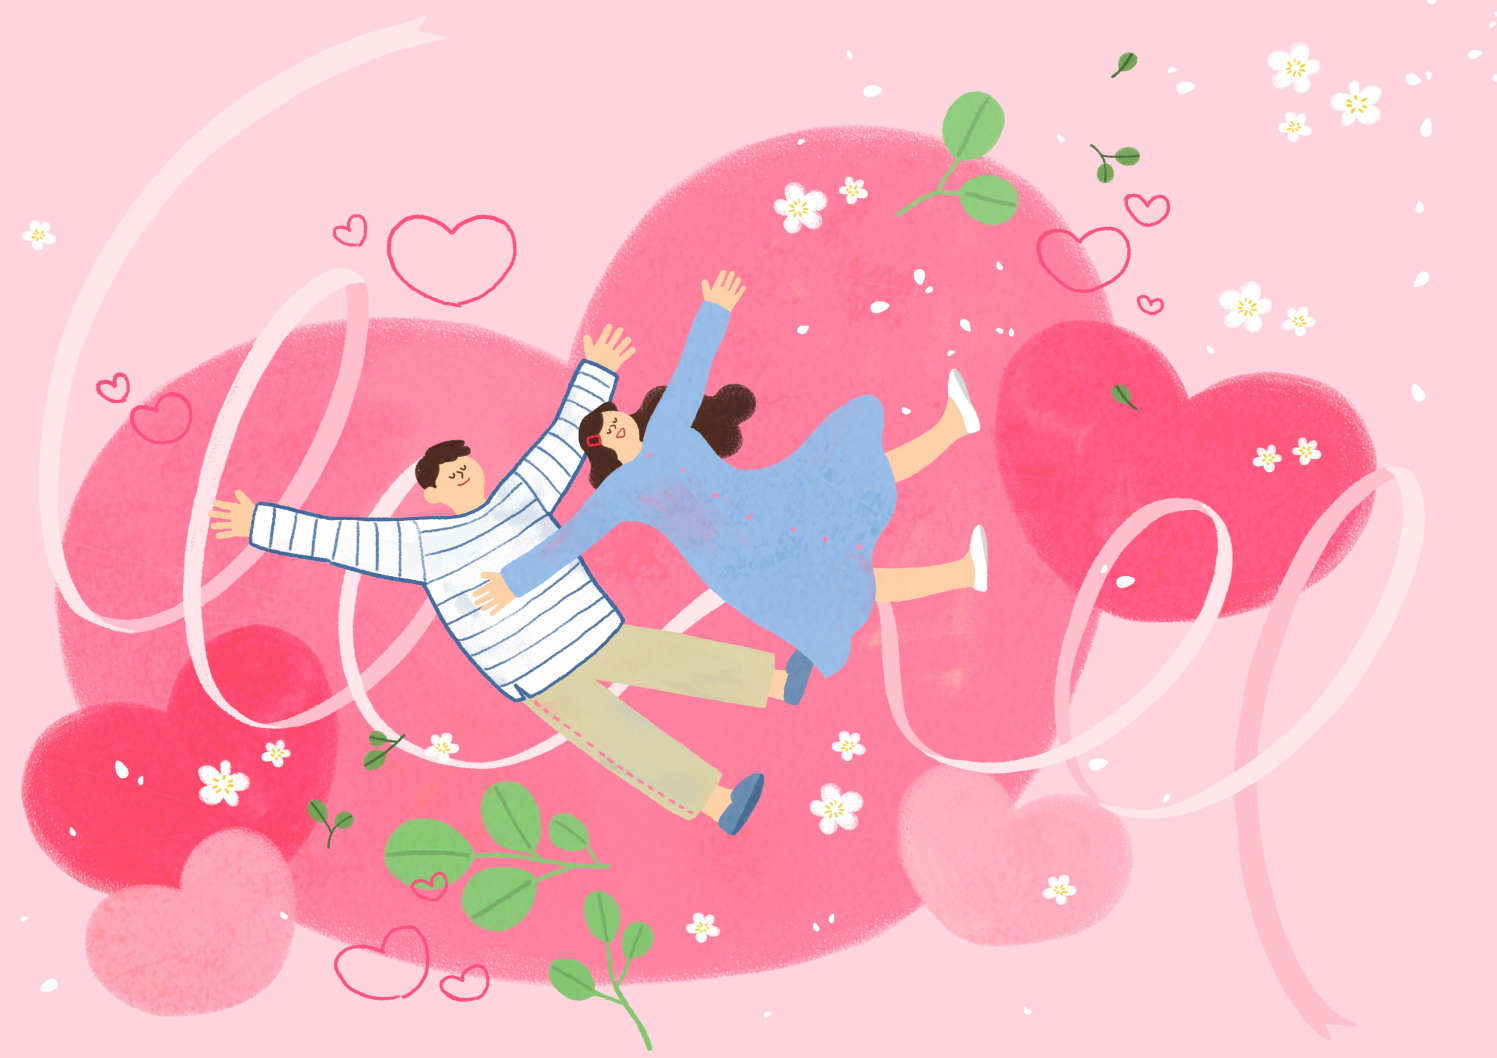 12款情人节七夕情侣手绘插画海报传单设计PSD素材 Valentines Day Couple Hand Drawn Illustration插图10